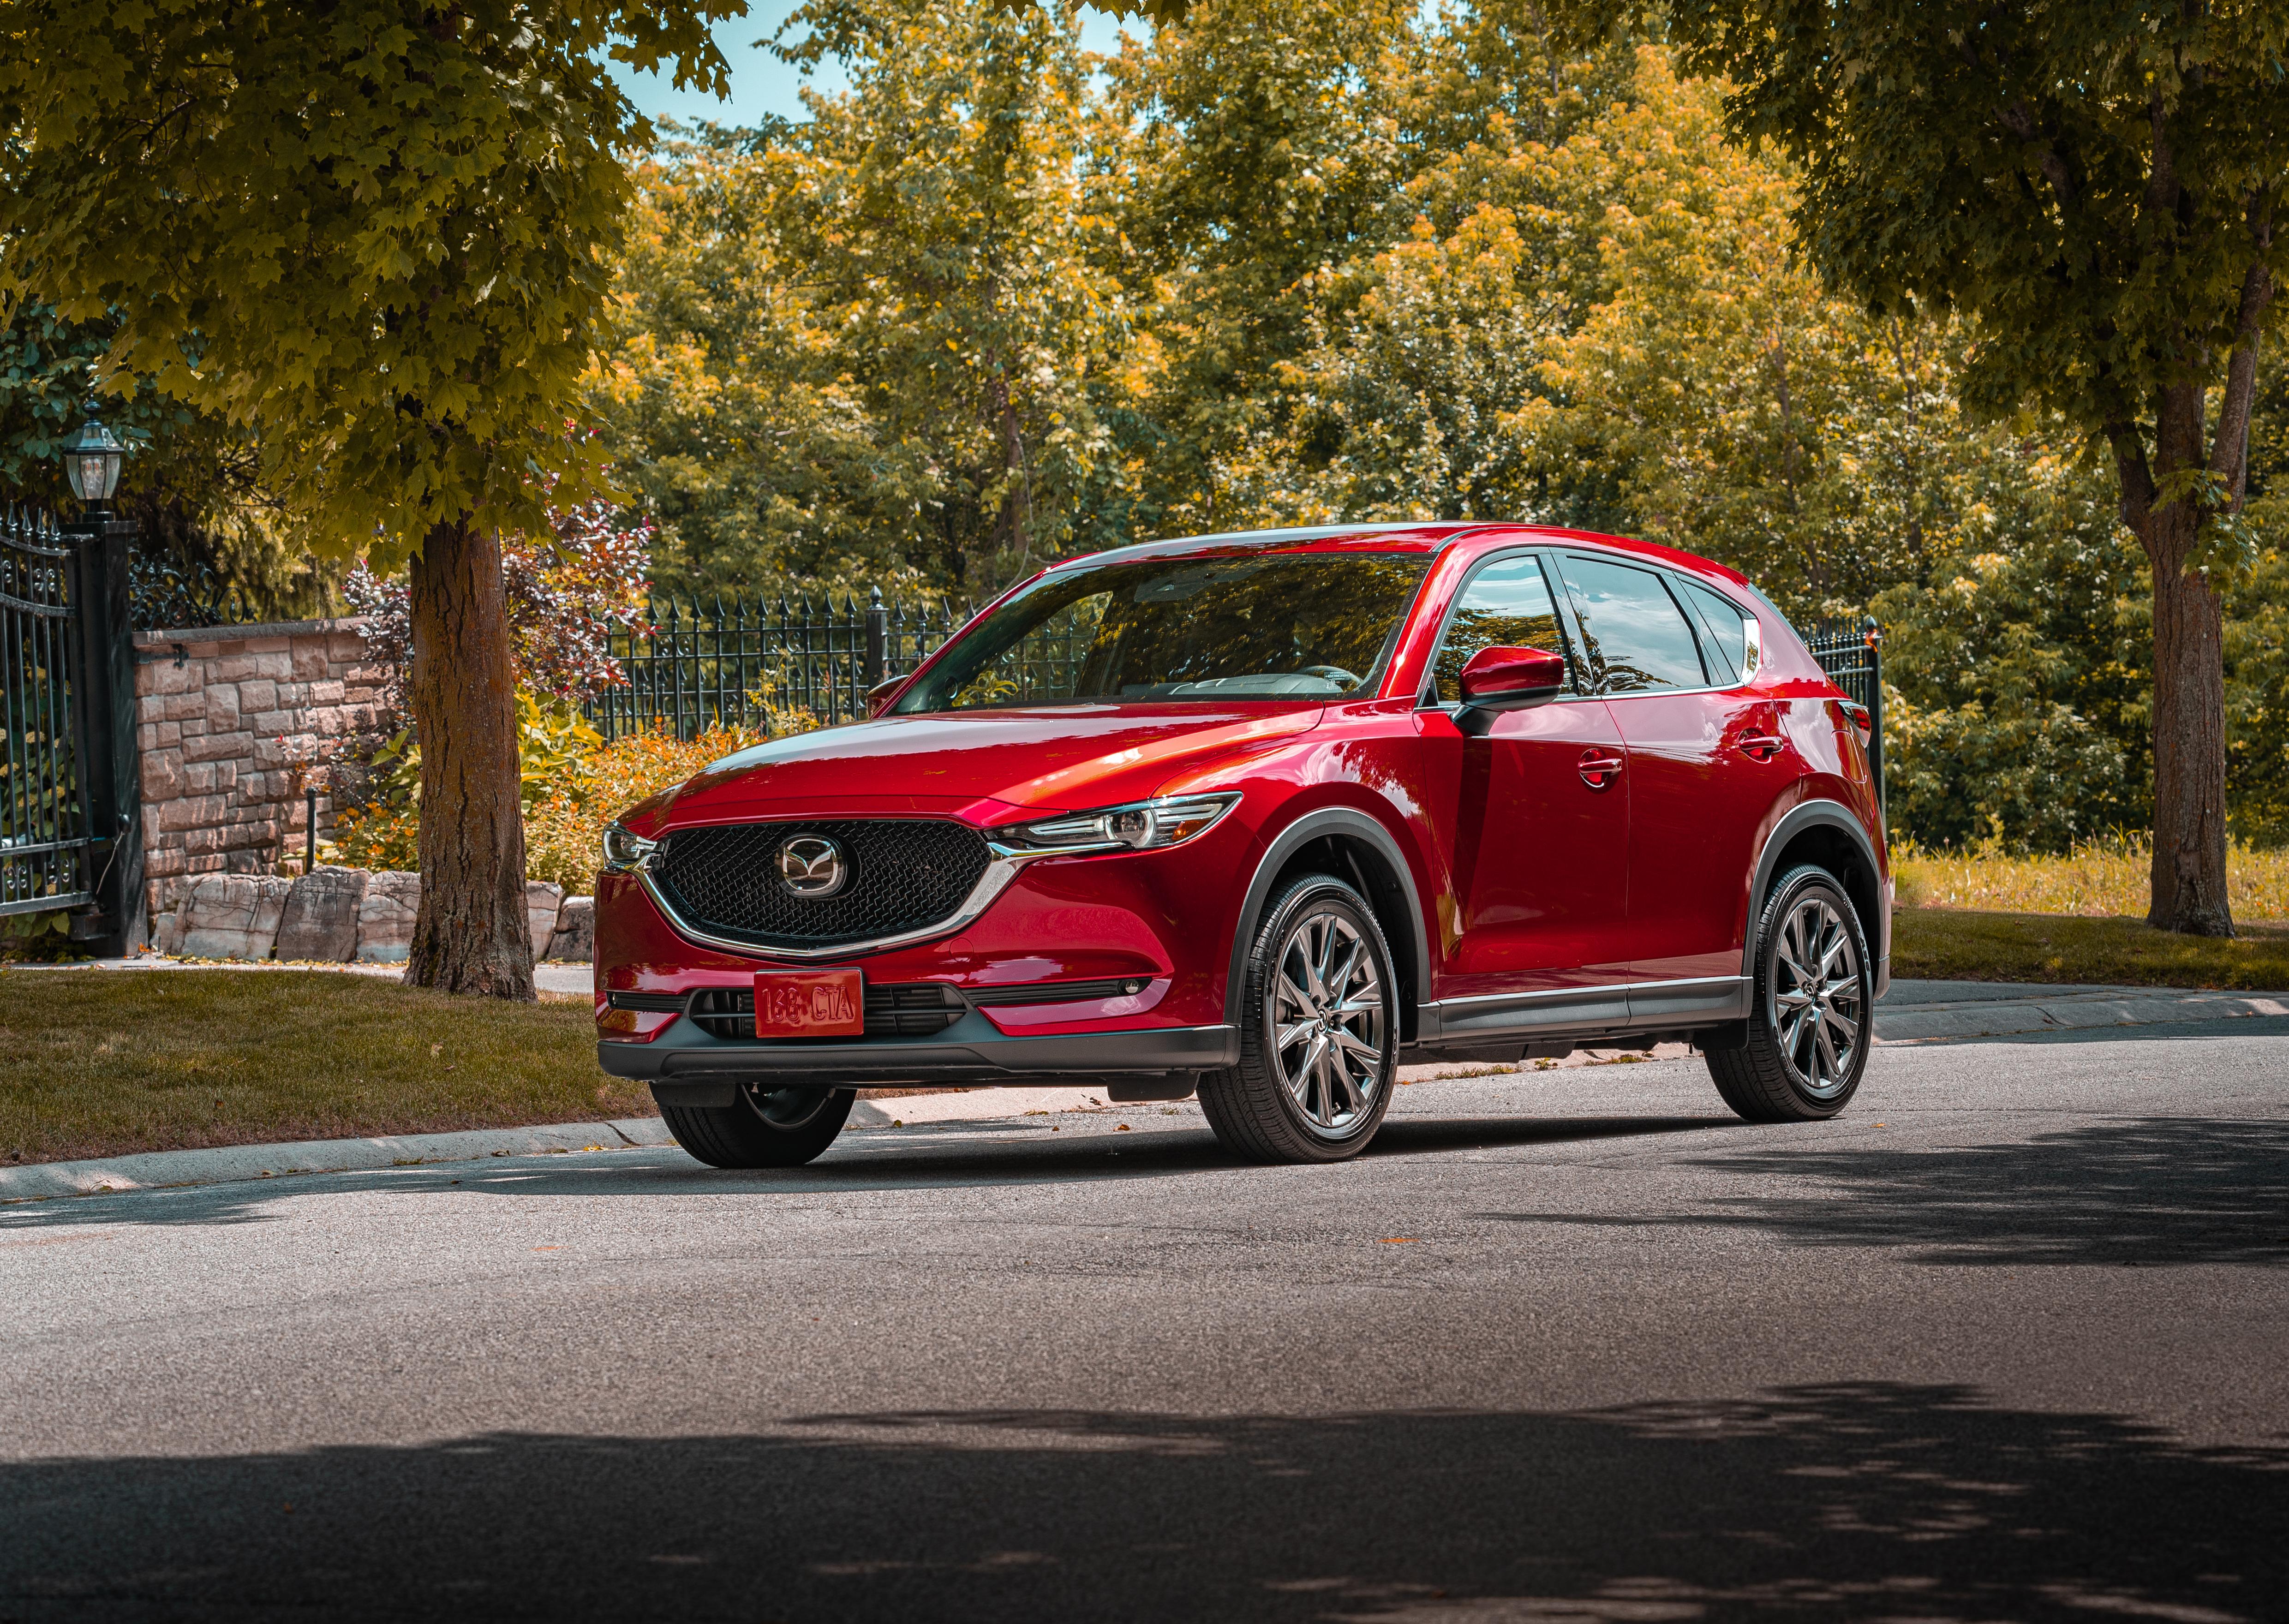 2020 Mazda Cx 5 Updated Standard I Activsense The Intelligent Driver